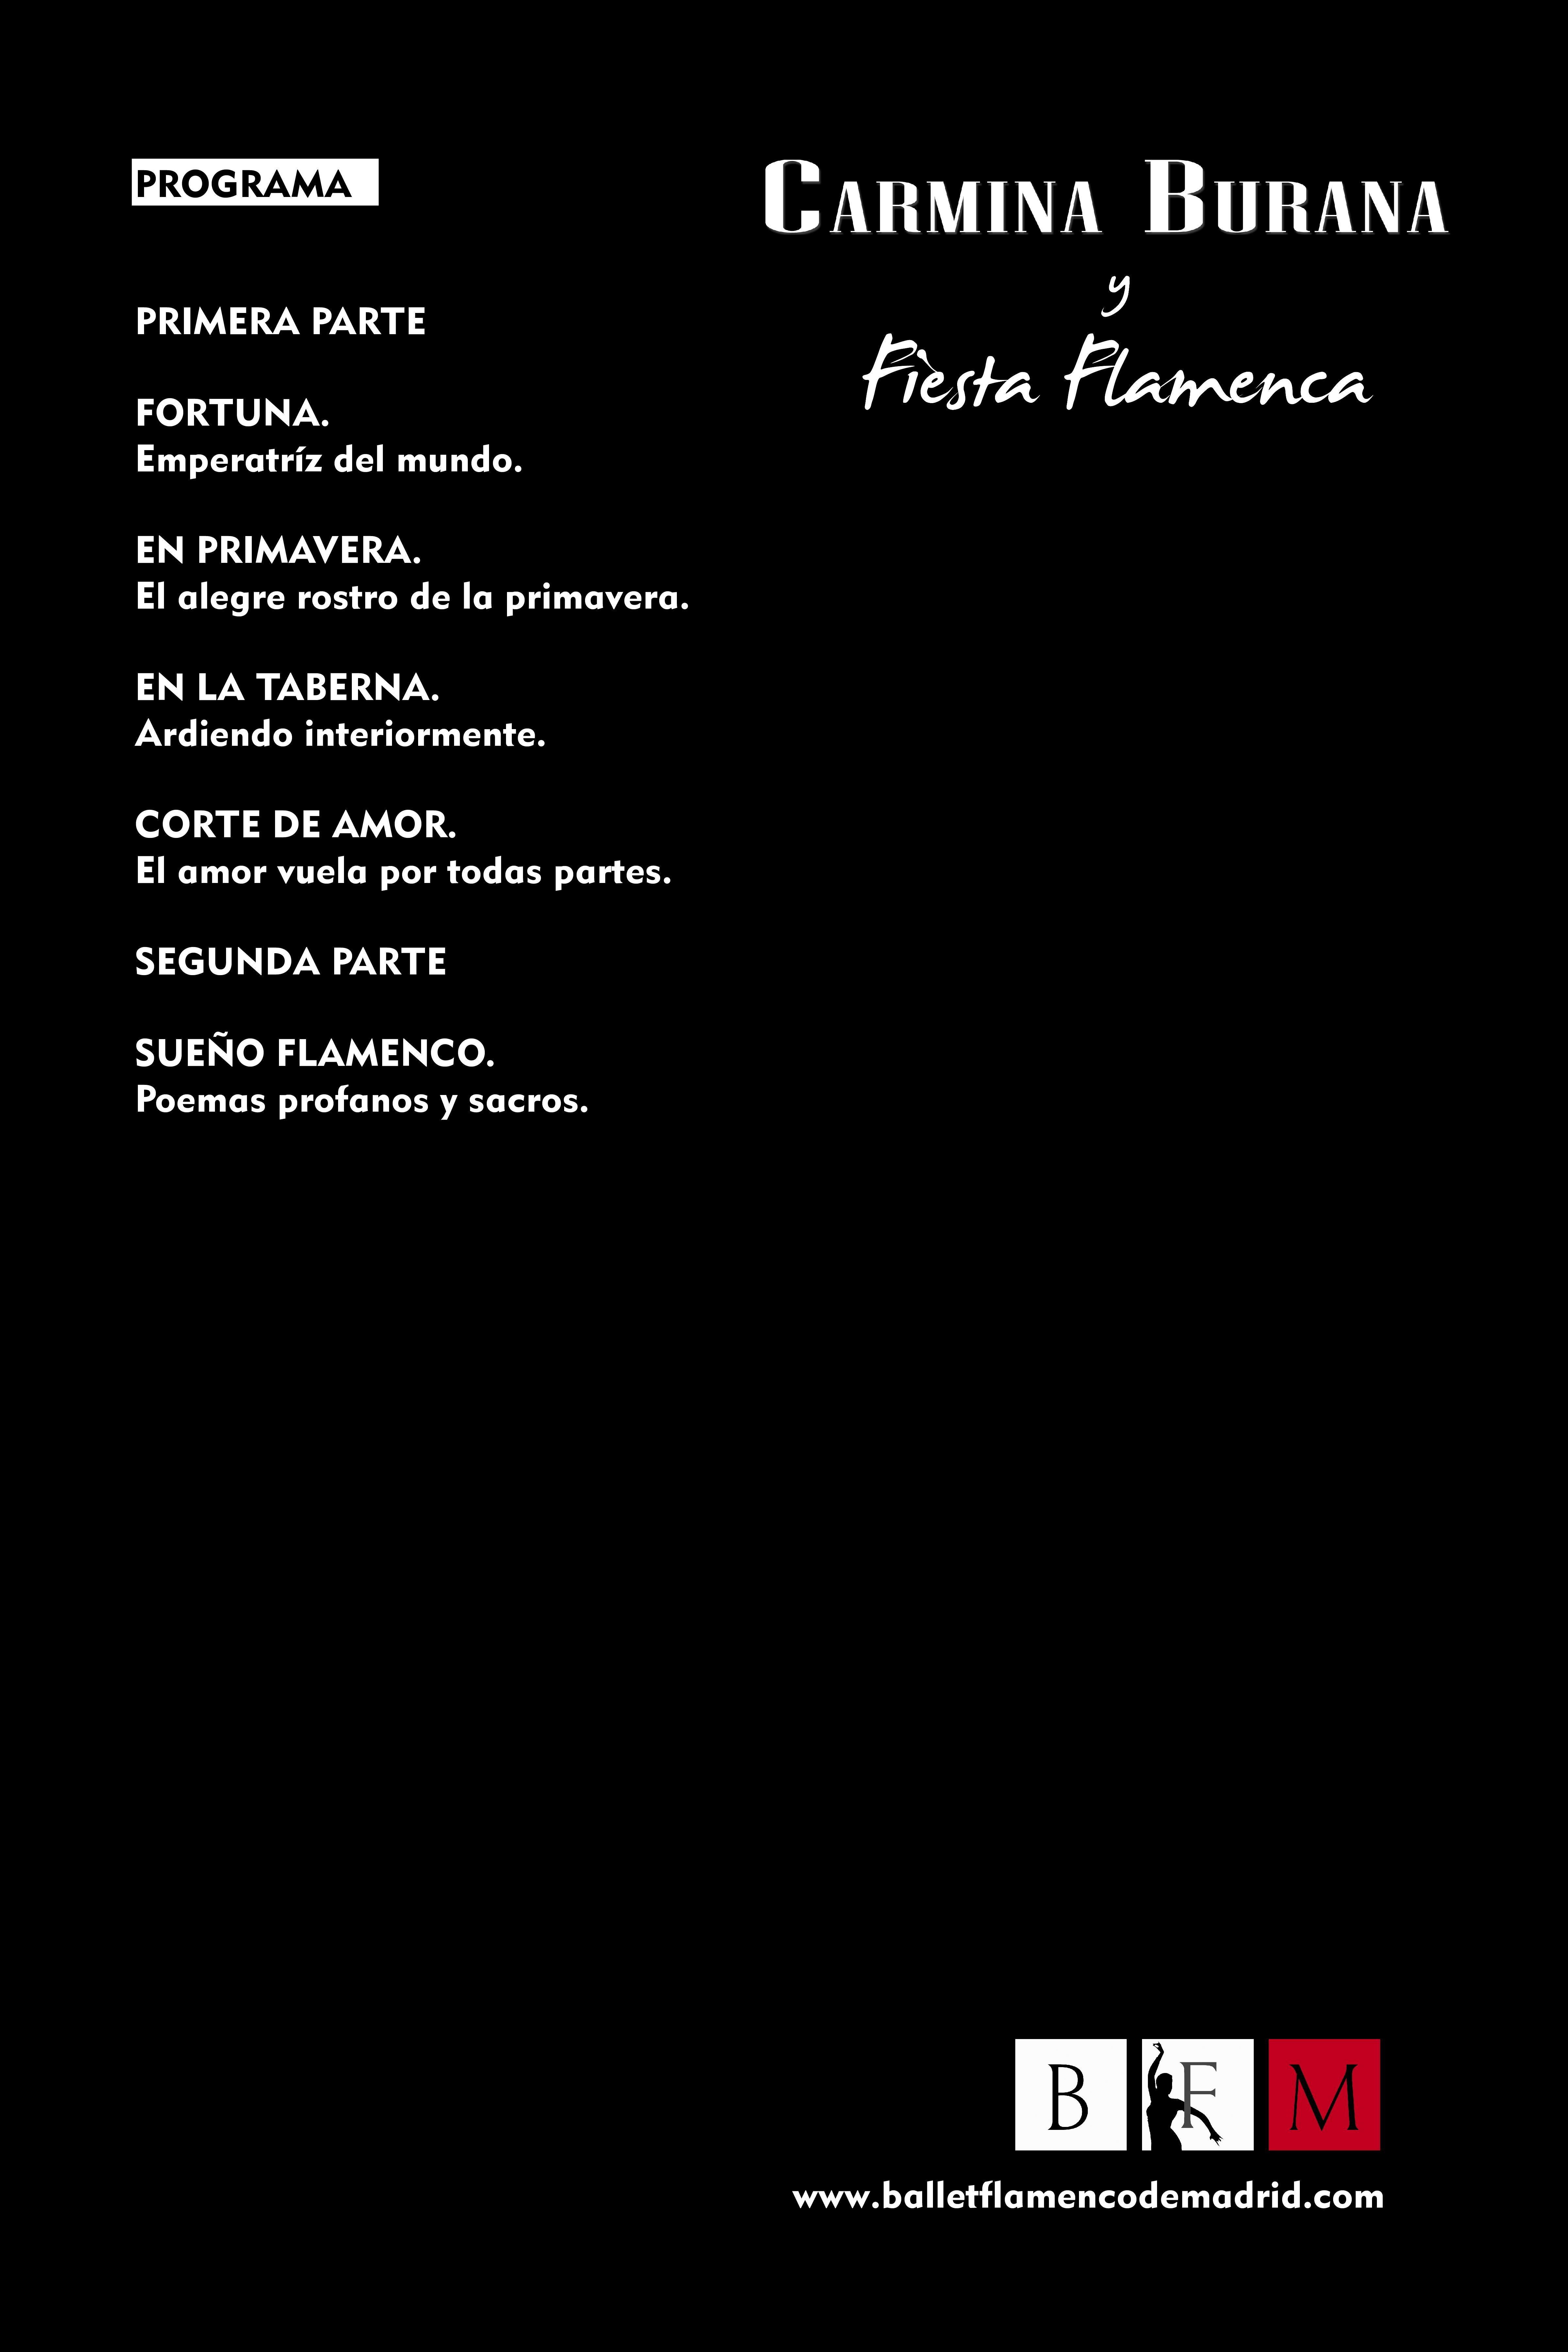 Carmina_programa_esp